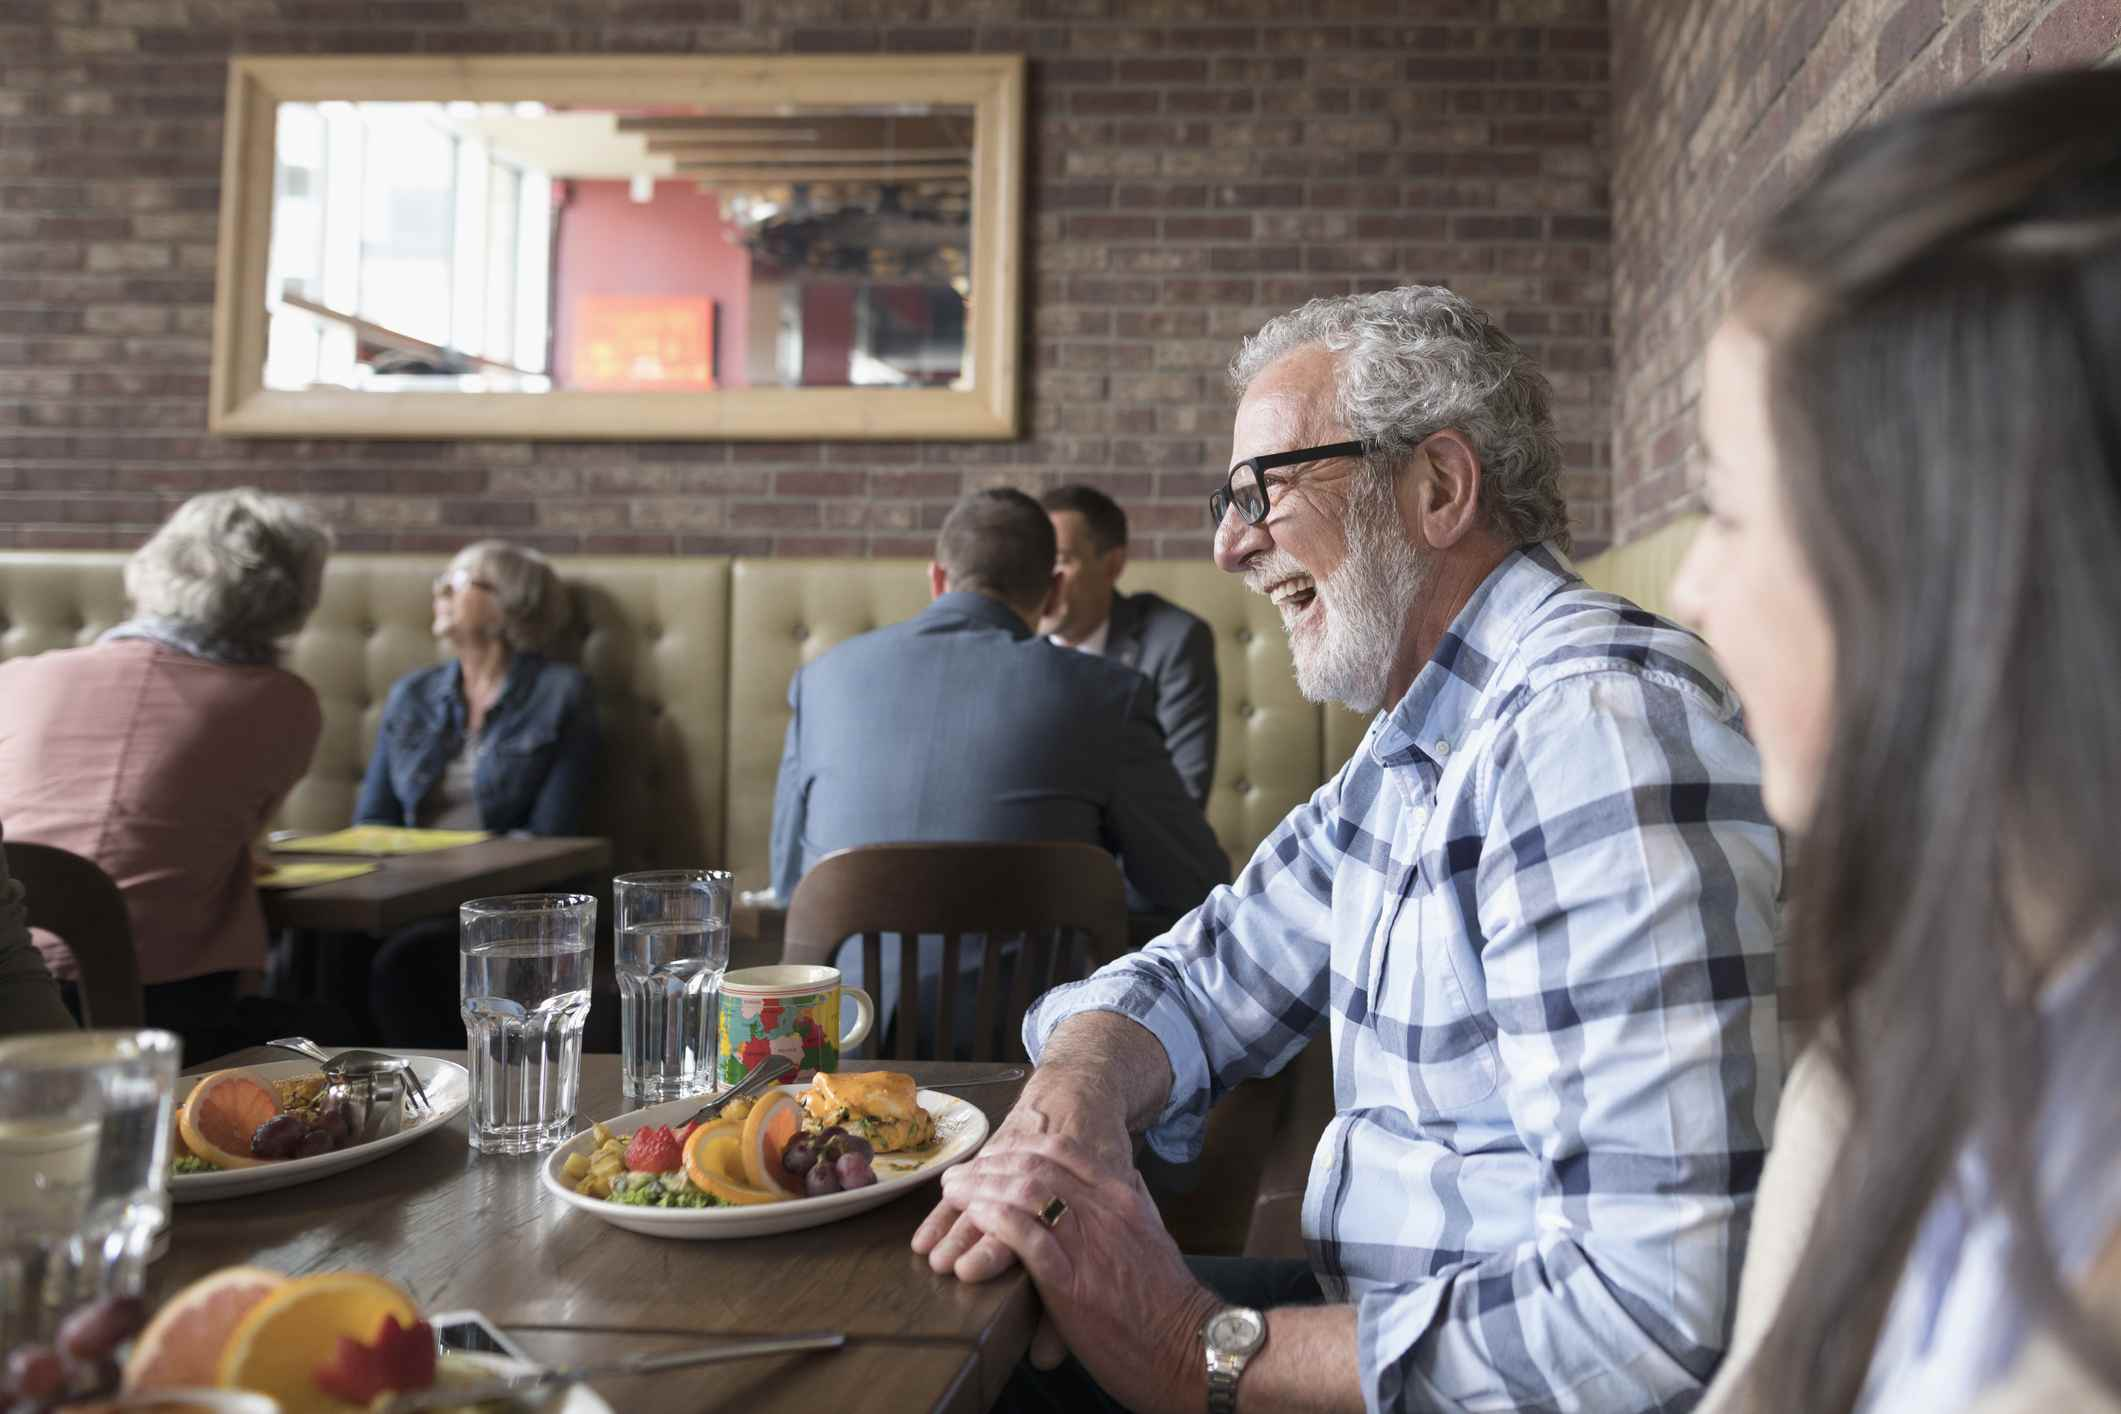 Man laughing in restaurant